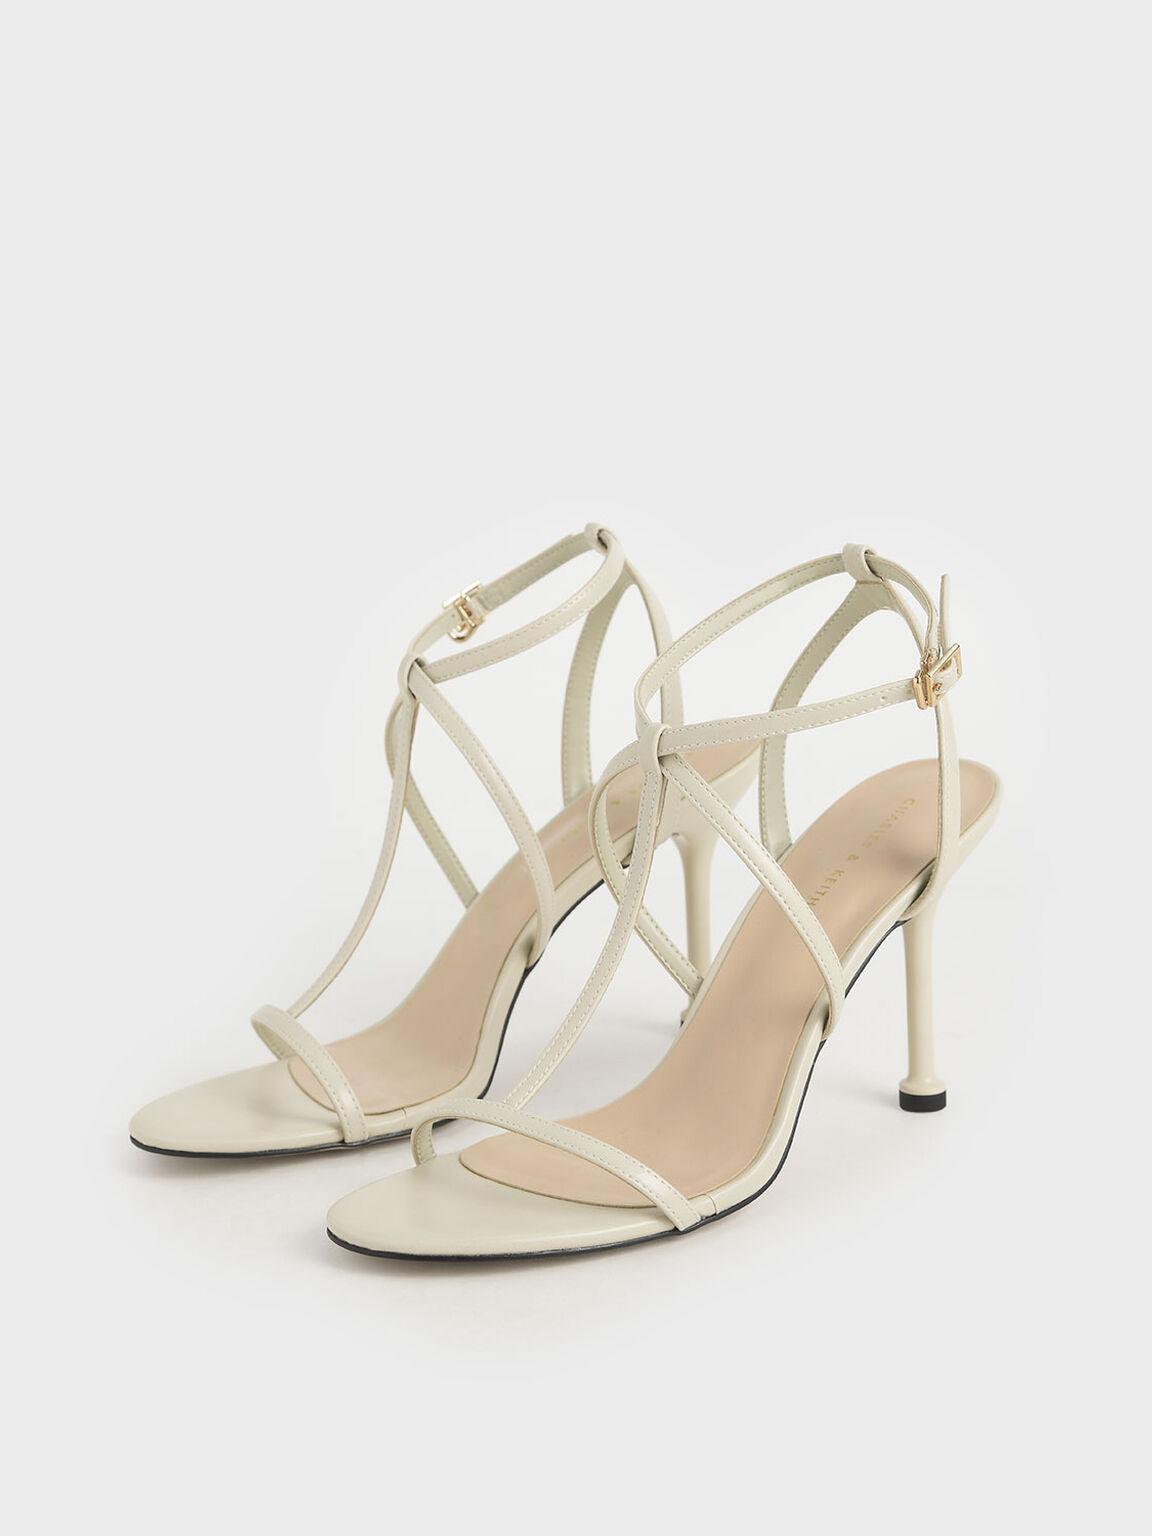 Strappy Stiletto Heels, Chalk, hi-res